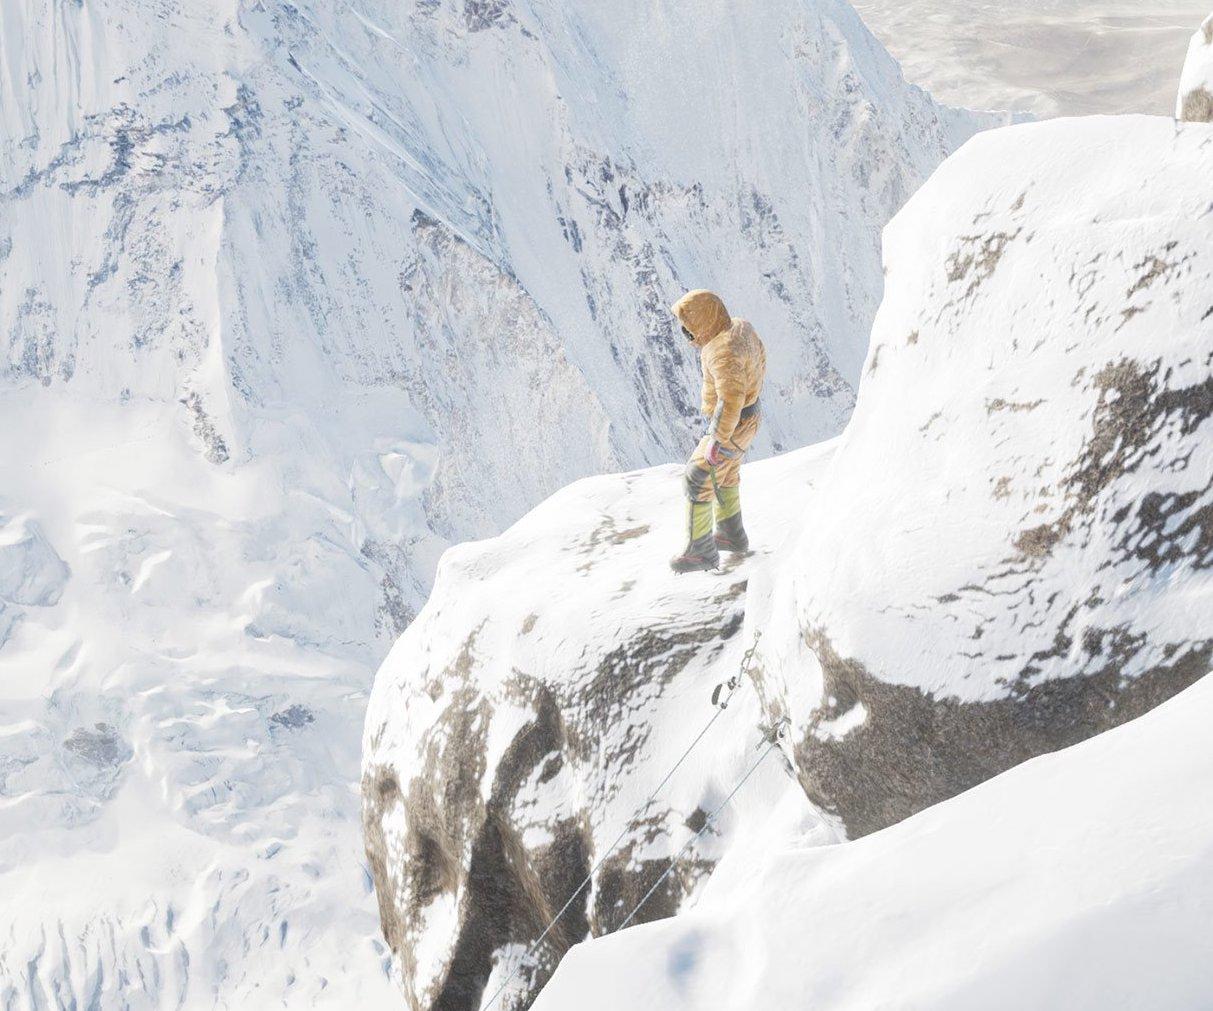 Everest.VR tra Scienza e Tecnologia, PlayStation e alta montagna